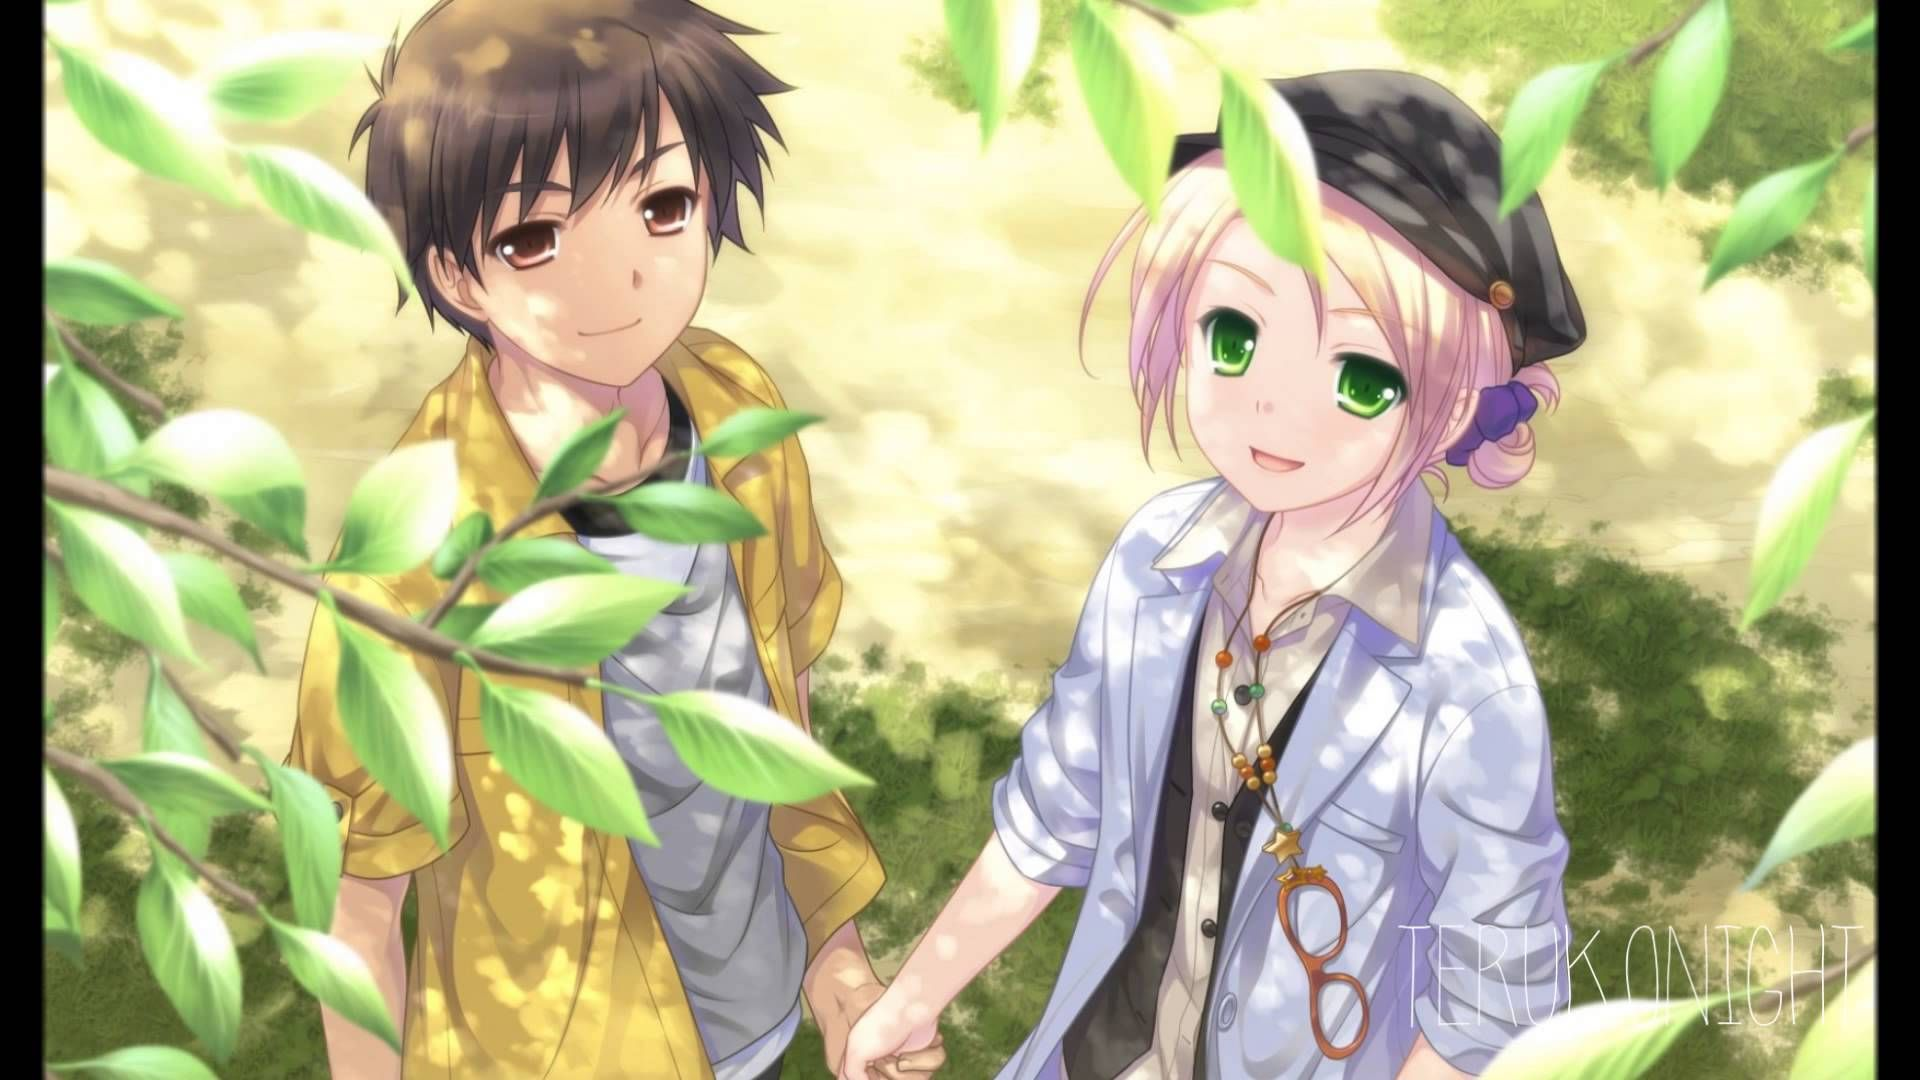 Somebody To You Nightcore Hd Cute Anime Wallpaper Anime Anime Love